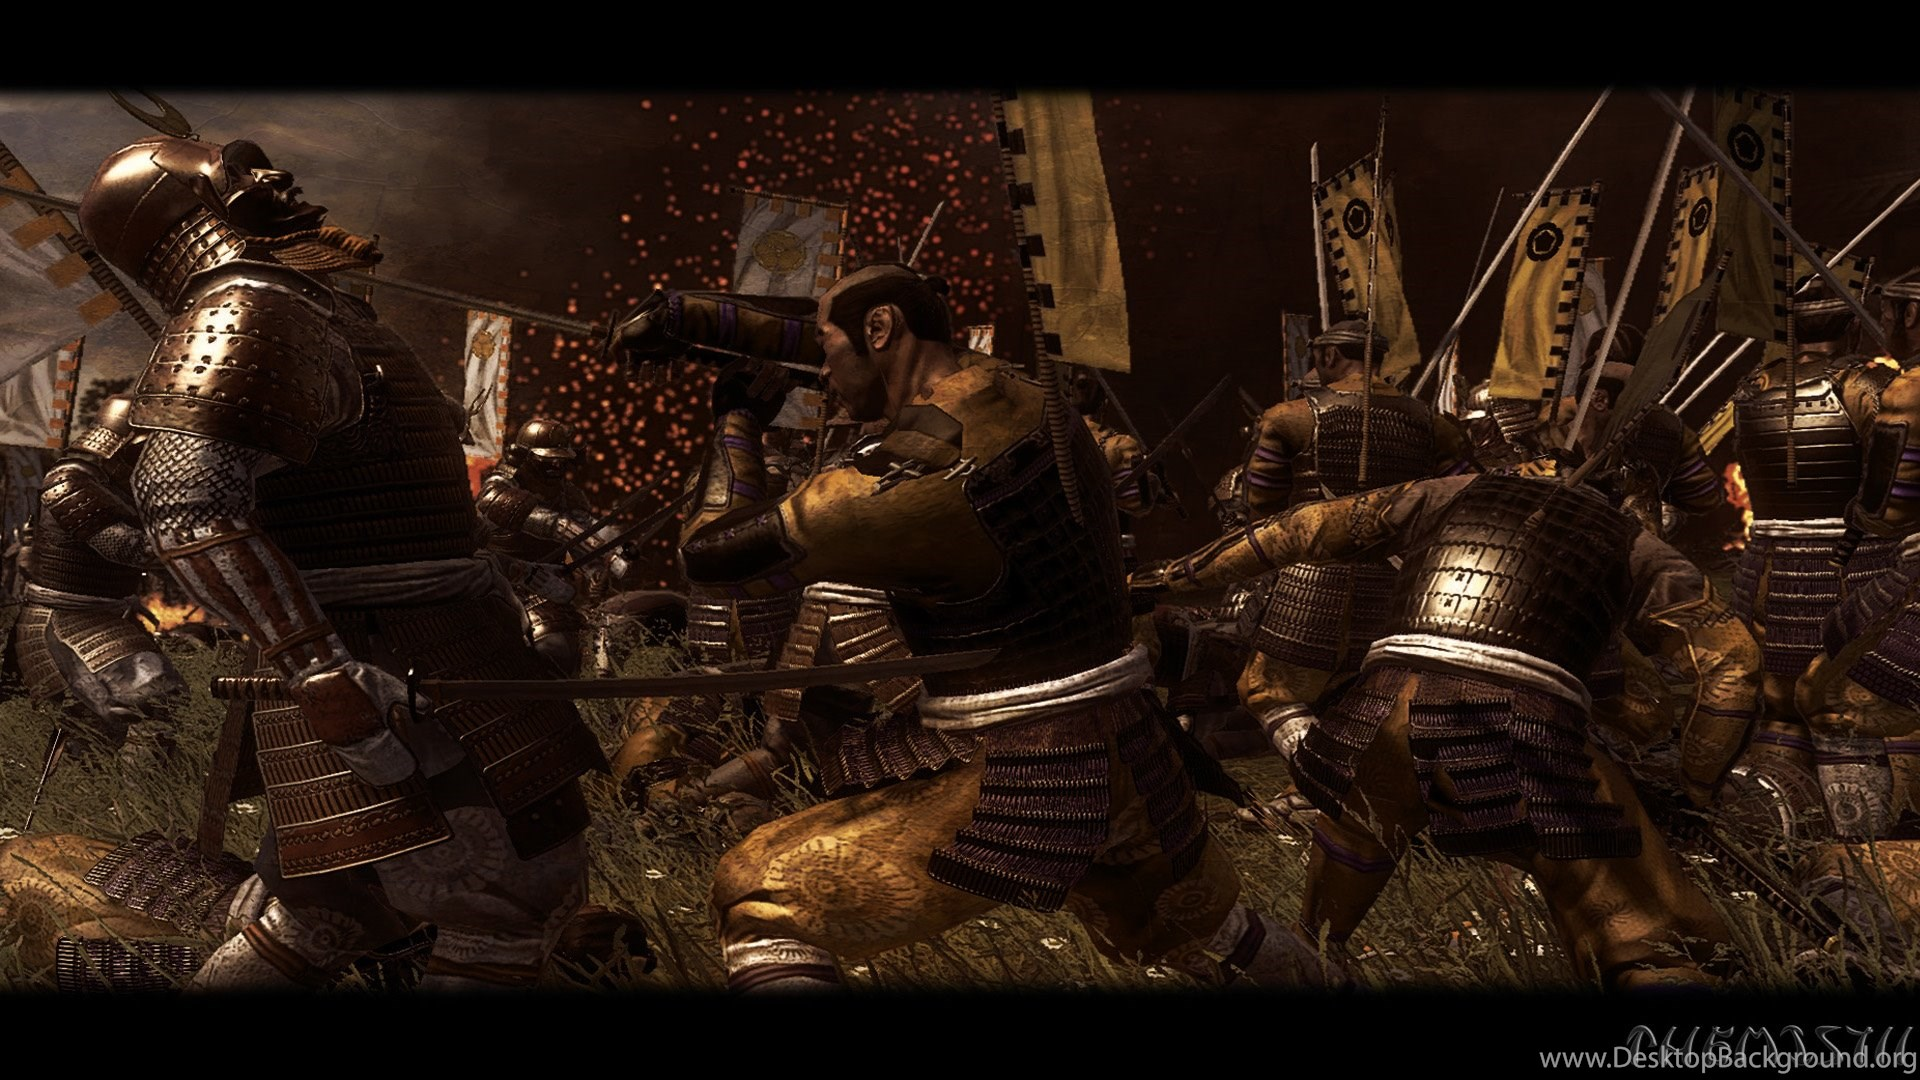 Shogun 2 Total War 1920x1080 Wallpapers Desktop Background